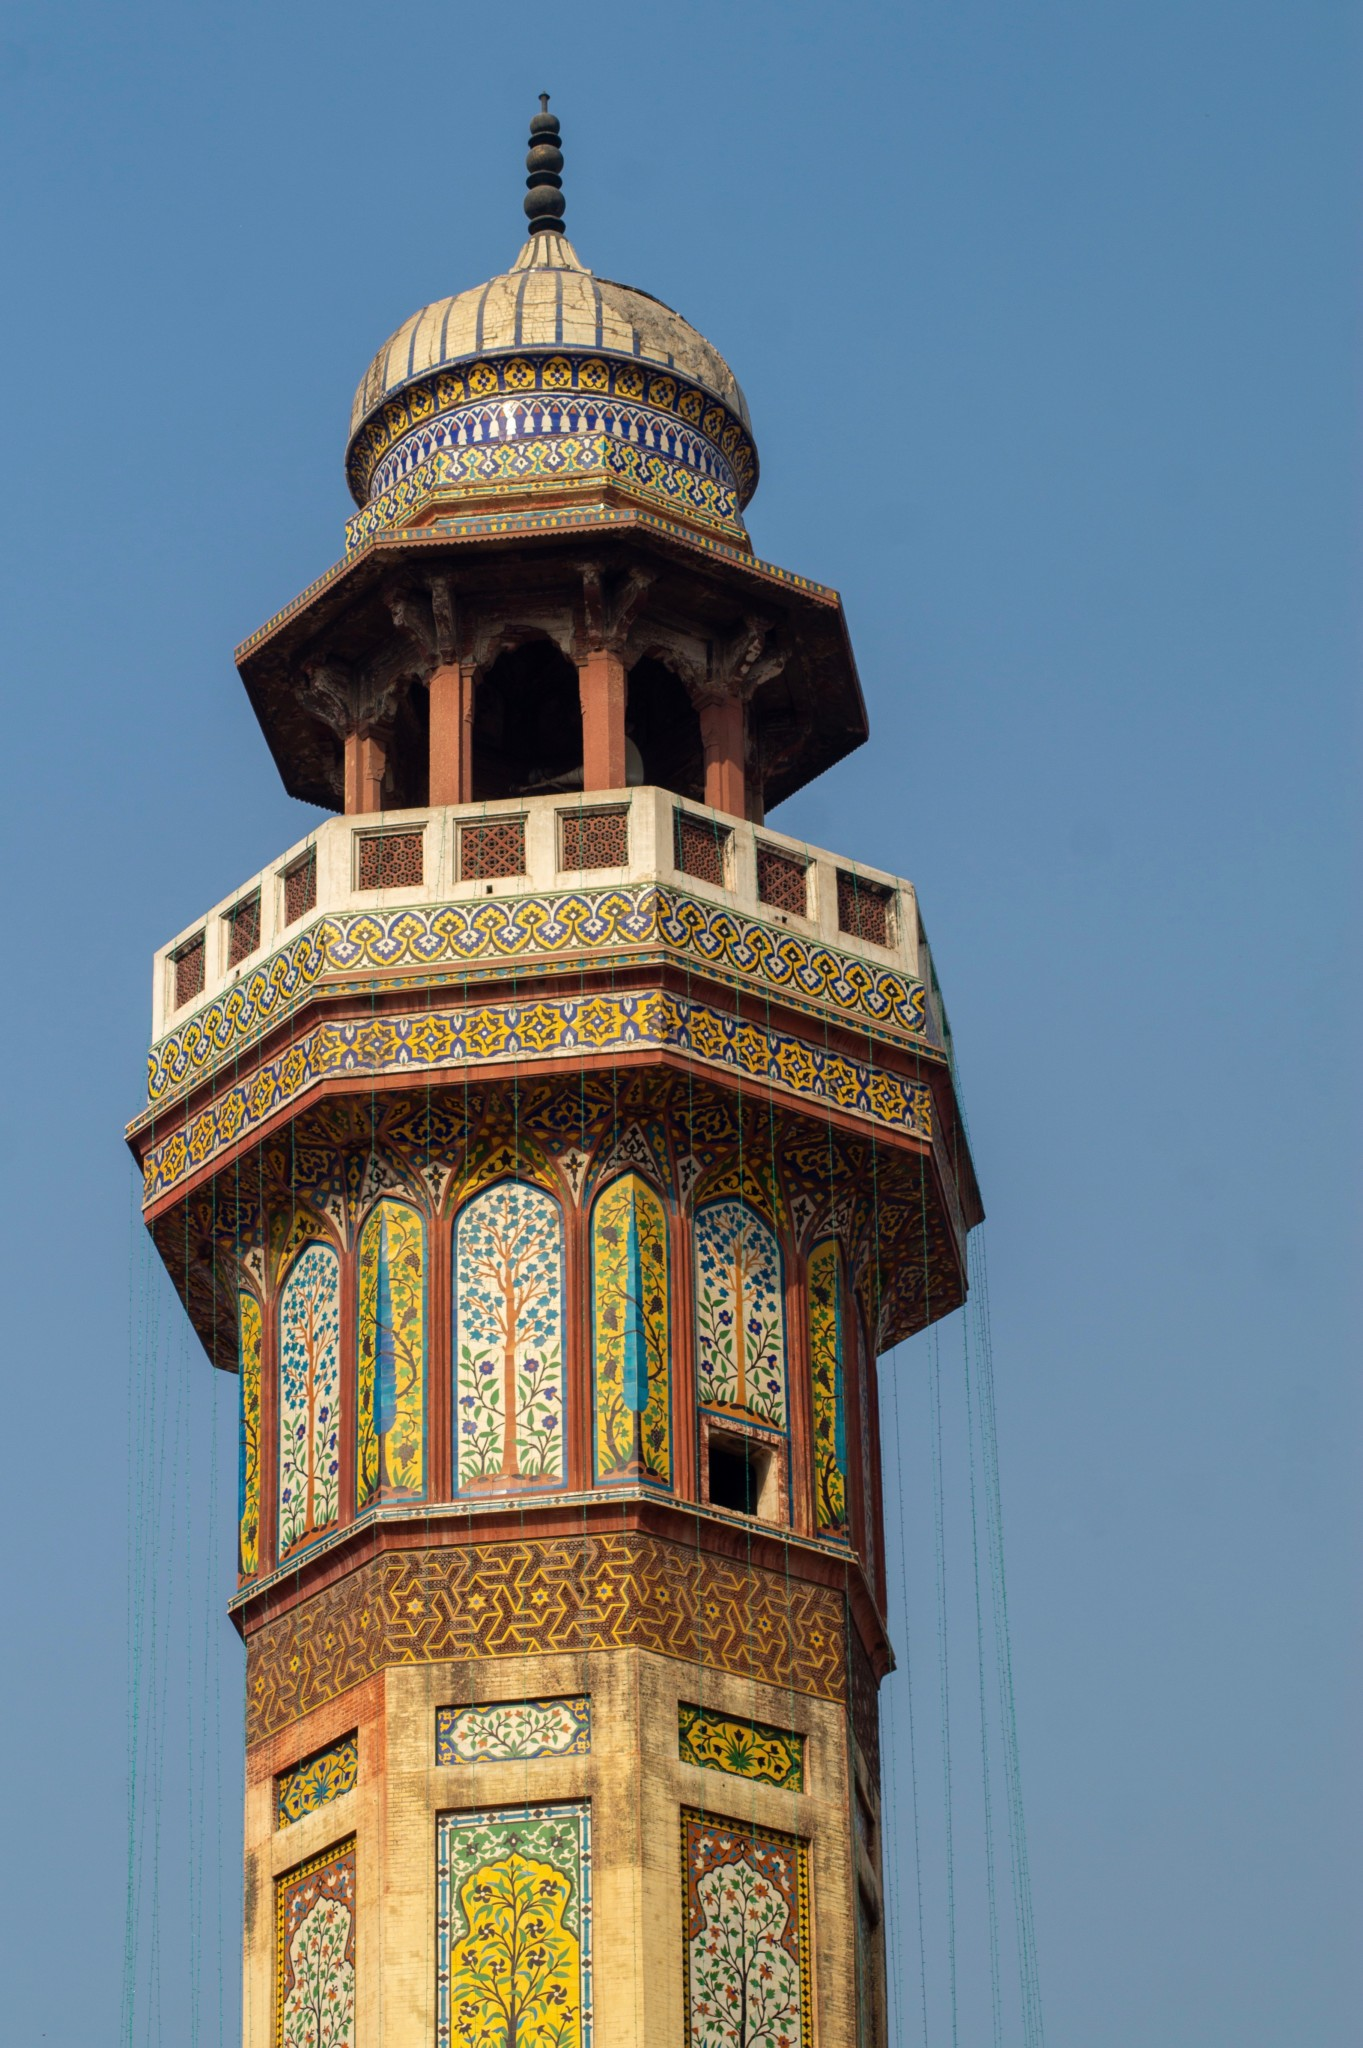 Minarett der Wazir Khan Moschee in der Walled City